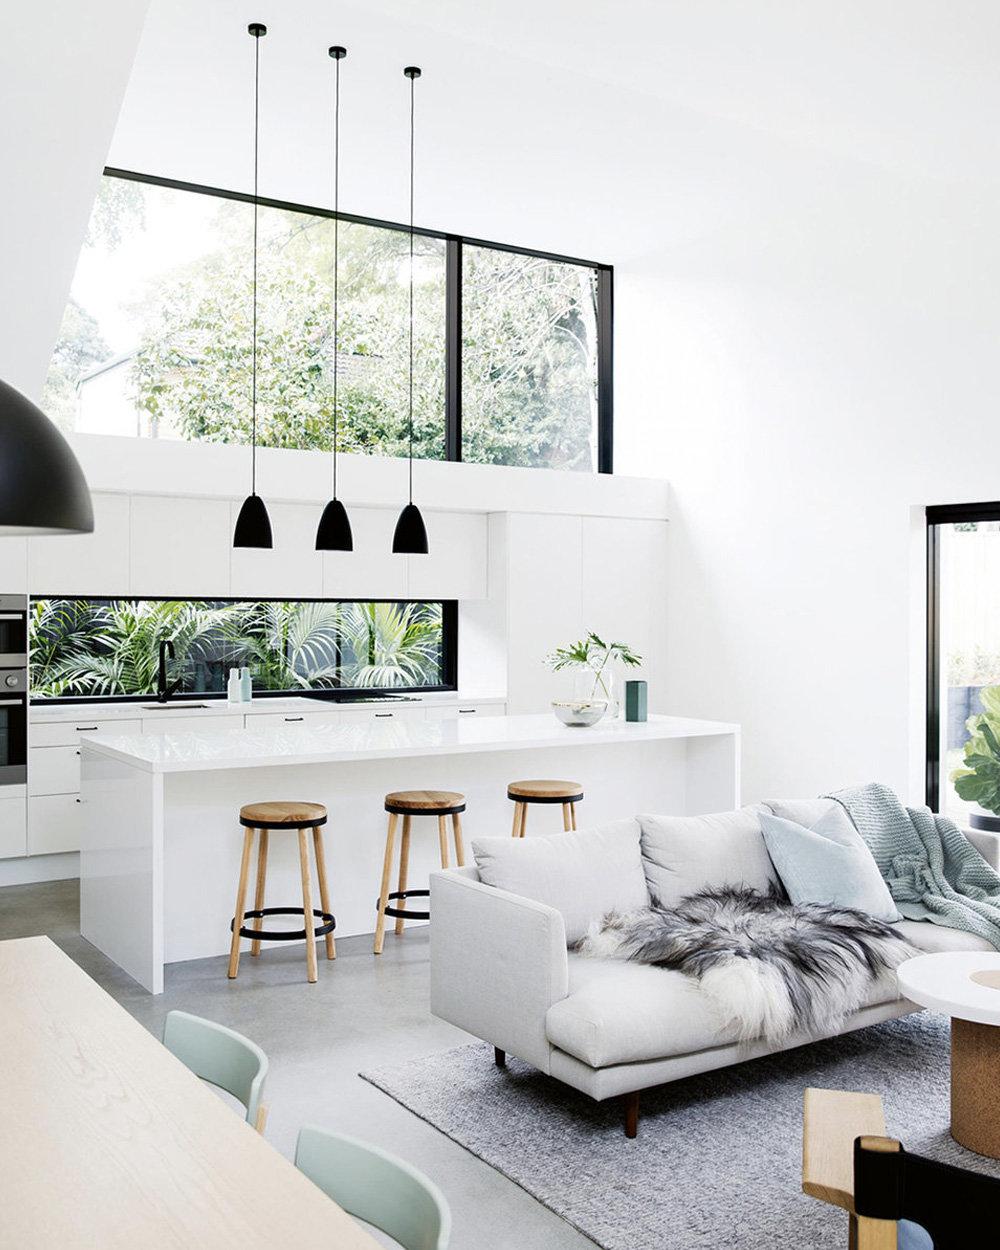 salle manger salon contemporain nature bleu vert blanc noir marron bton cir bois peinture fourrure